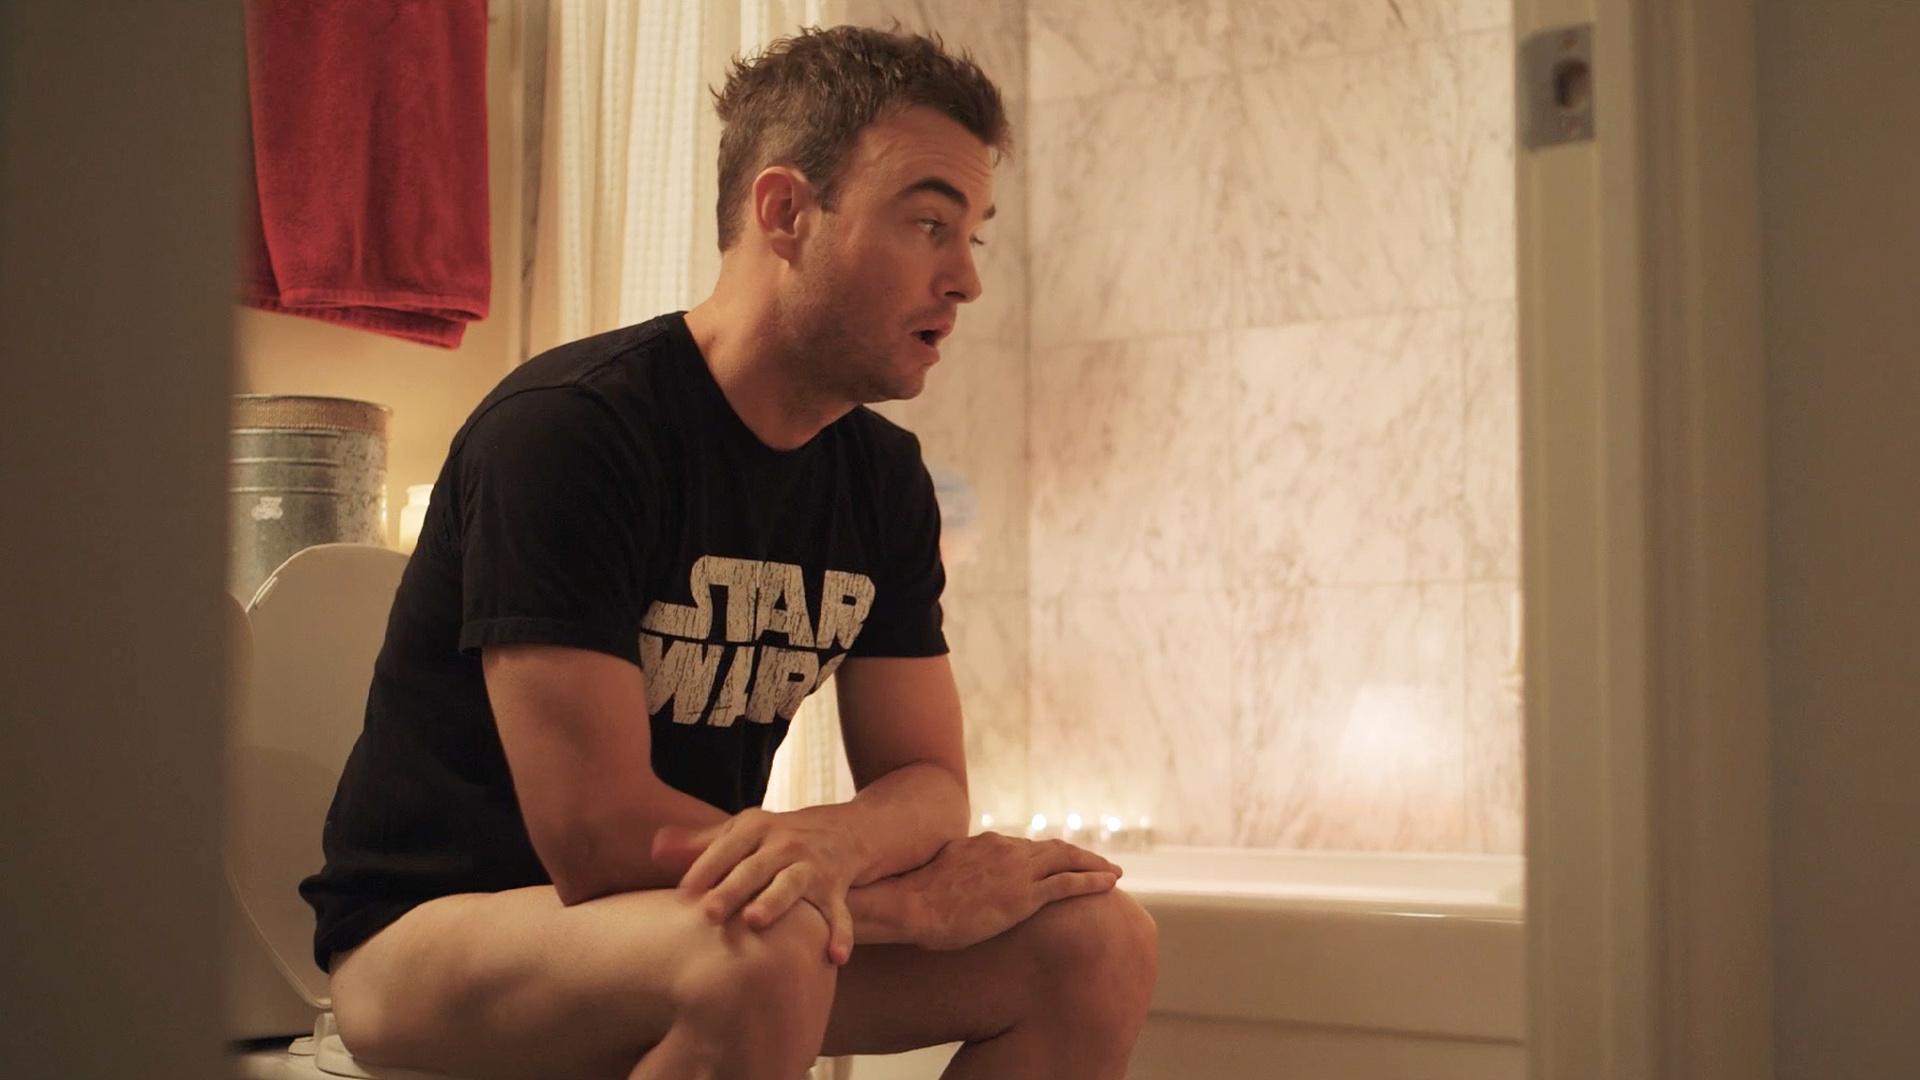 Bubble bath interruptus